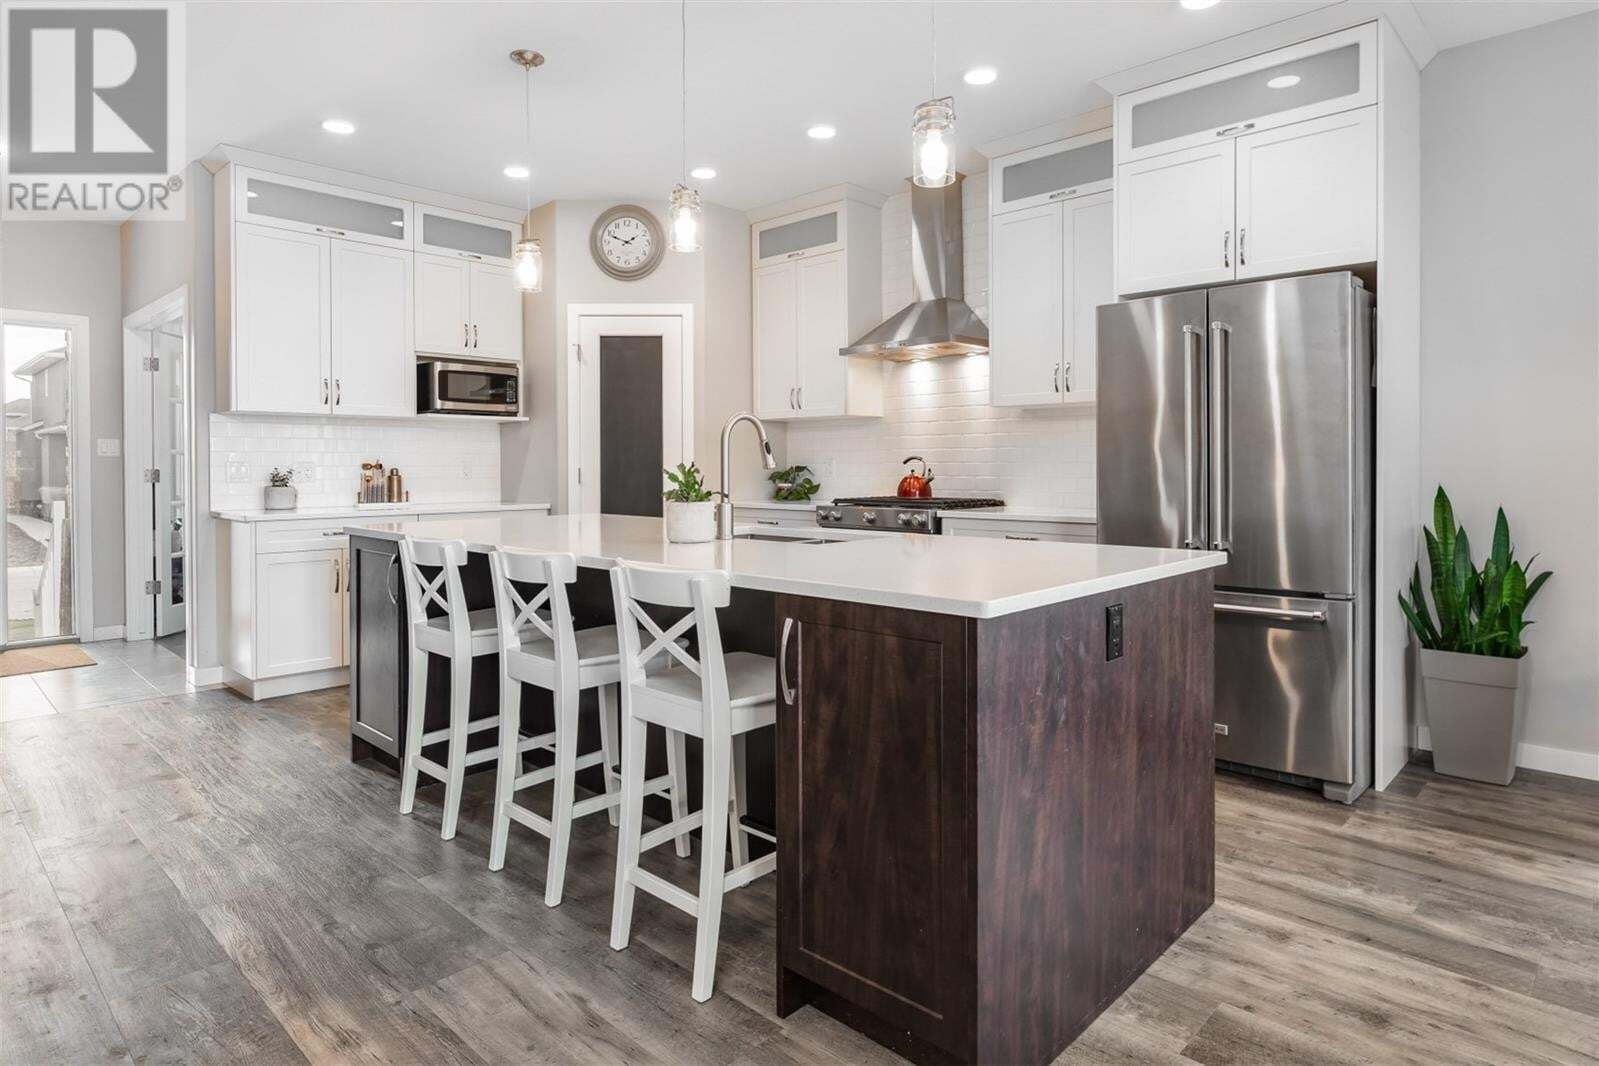 House for sale at 319 Boykowich St Saskatoon Saskatchewan - MLS: SK819745